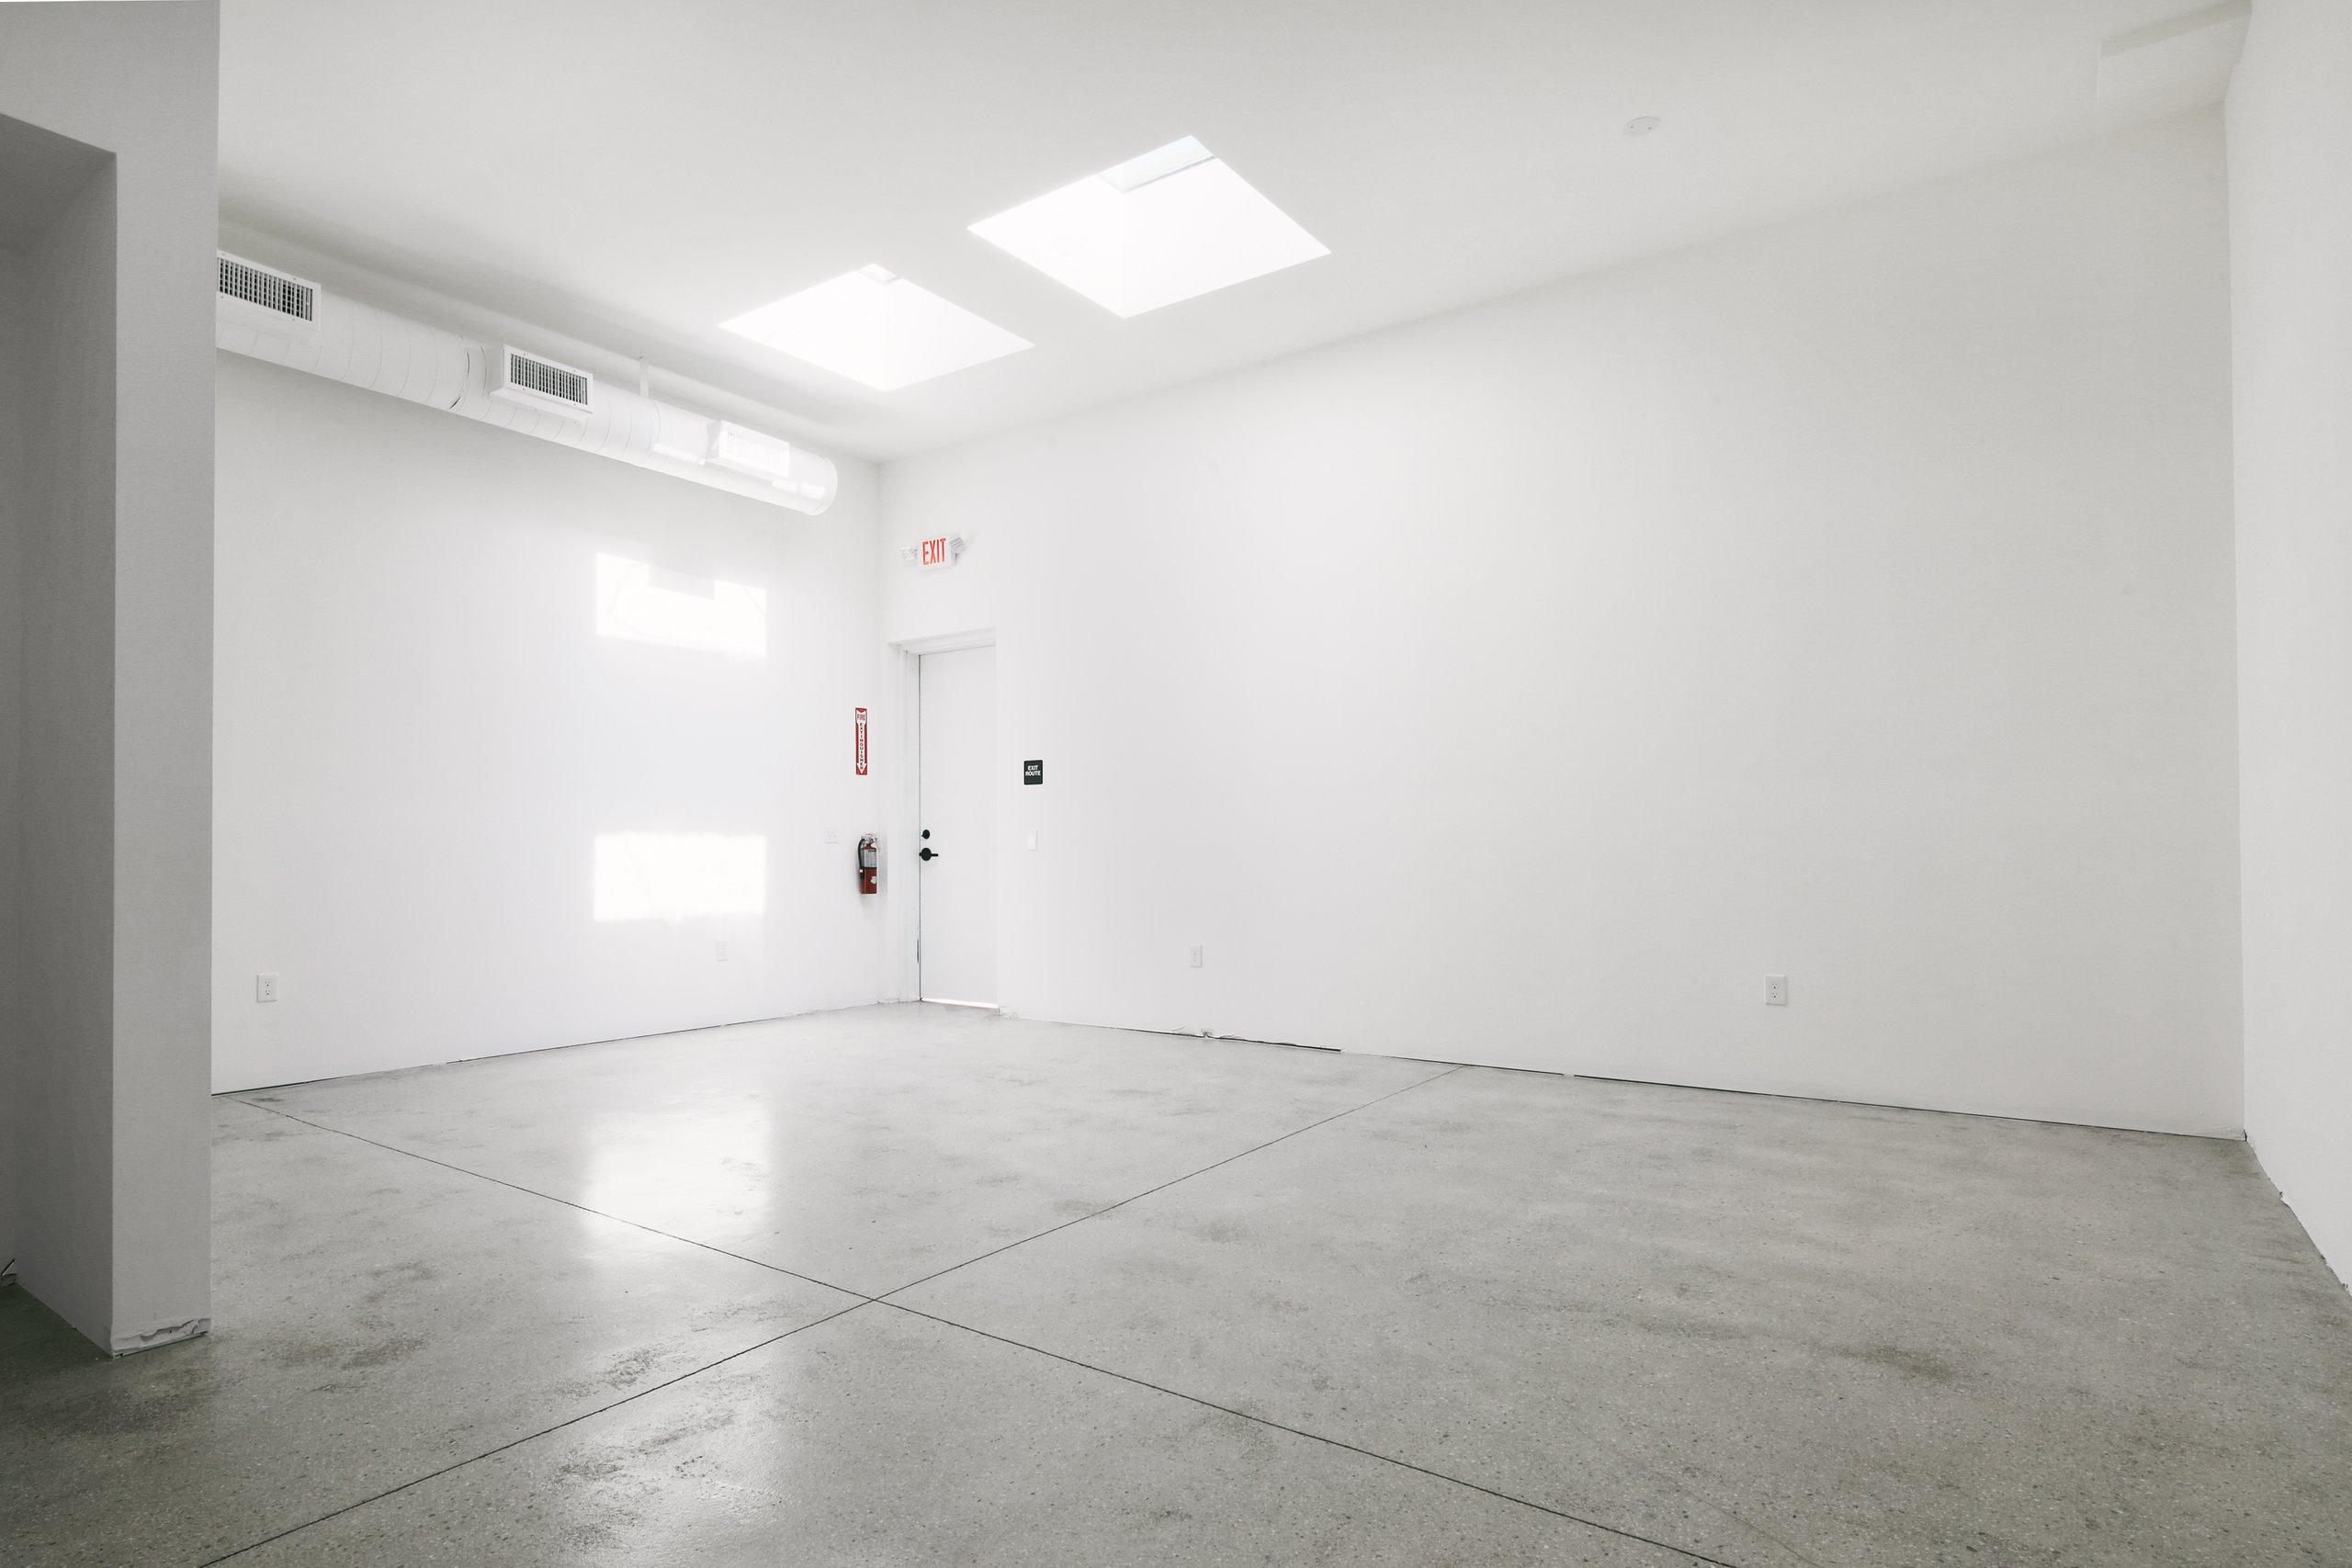 20x80 Warehouse self storage unit